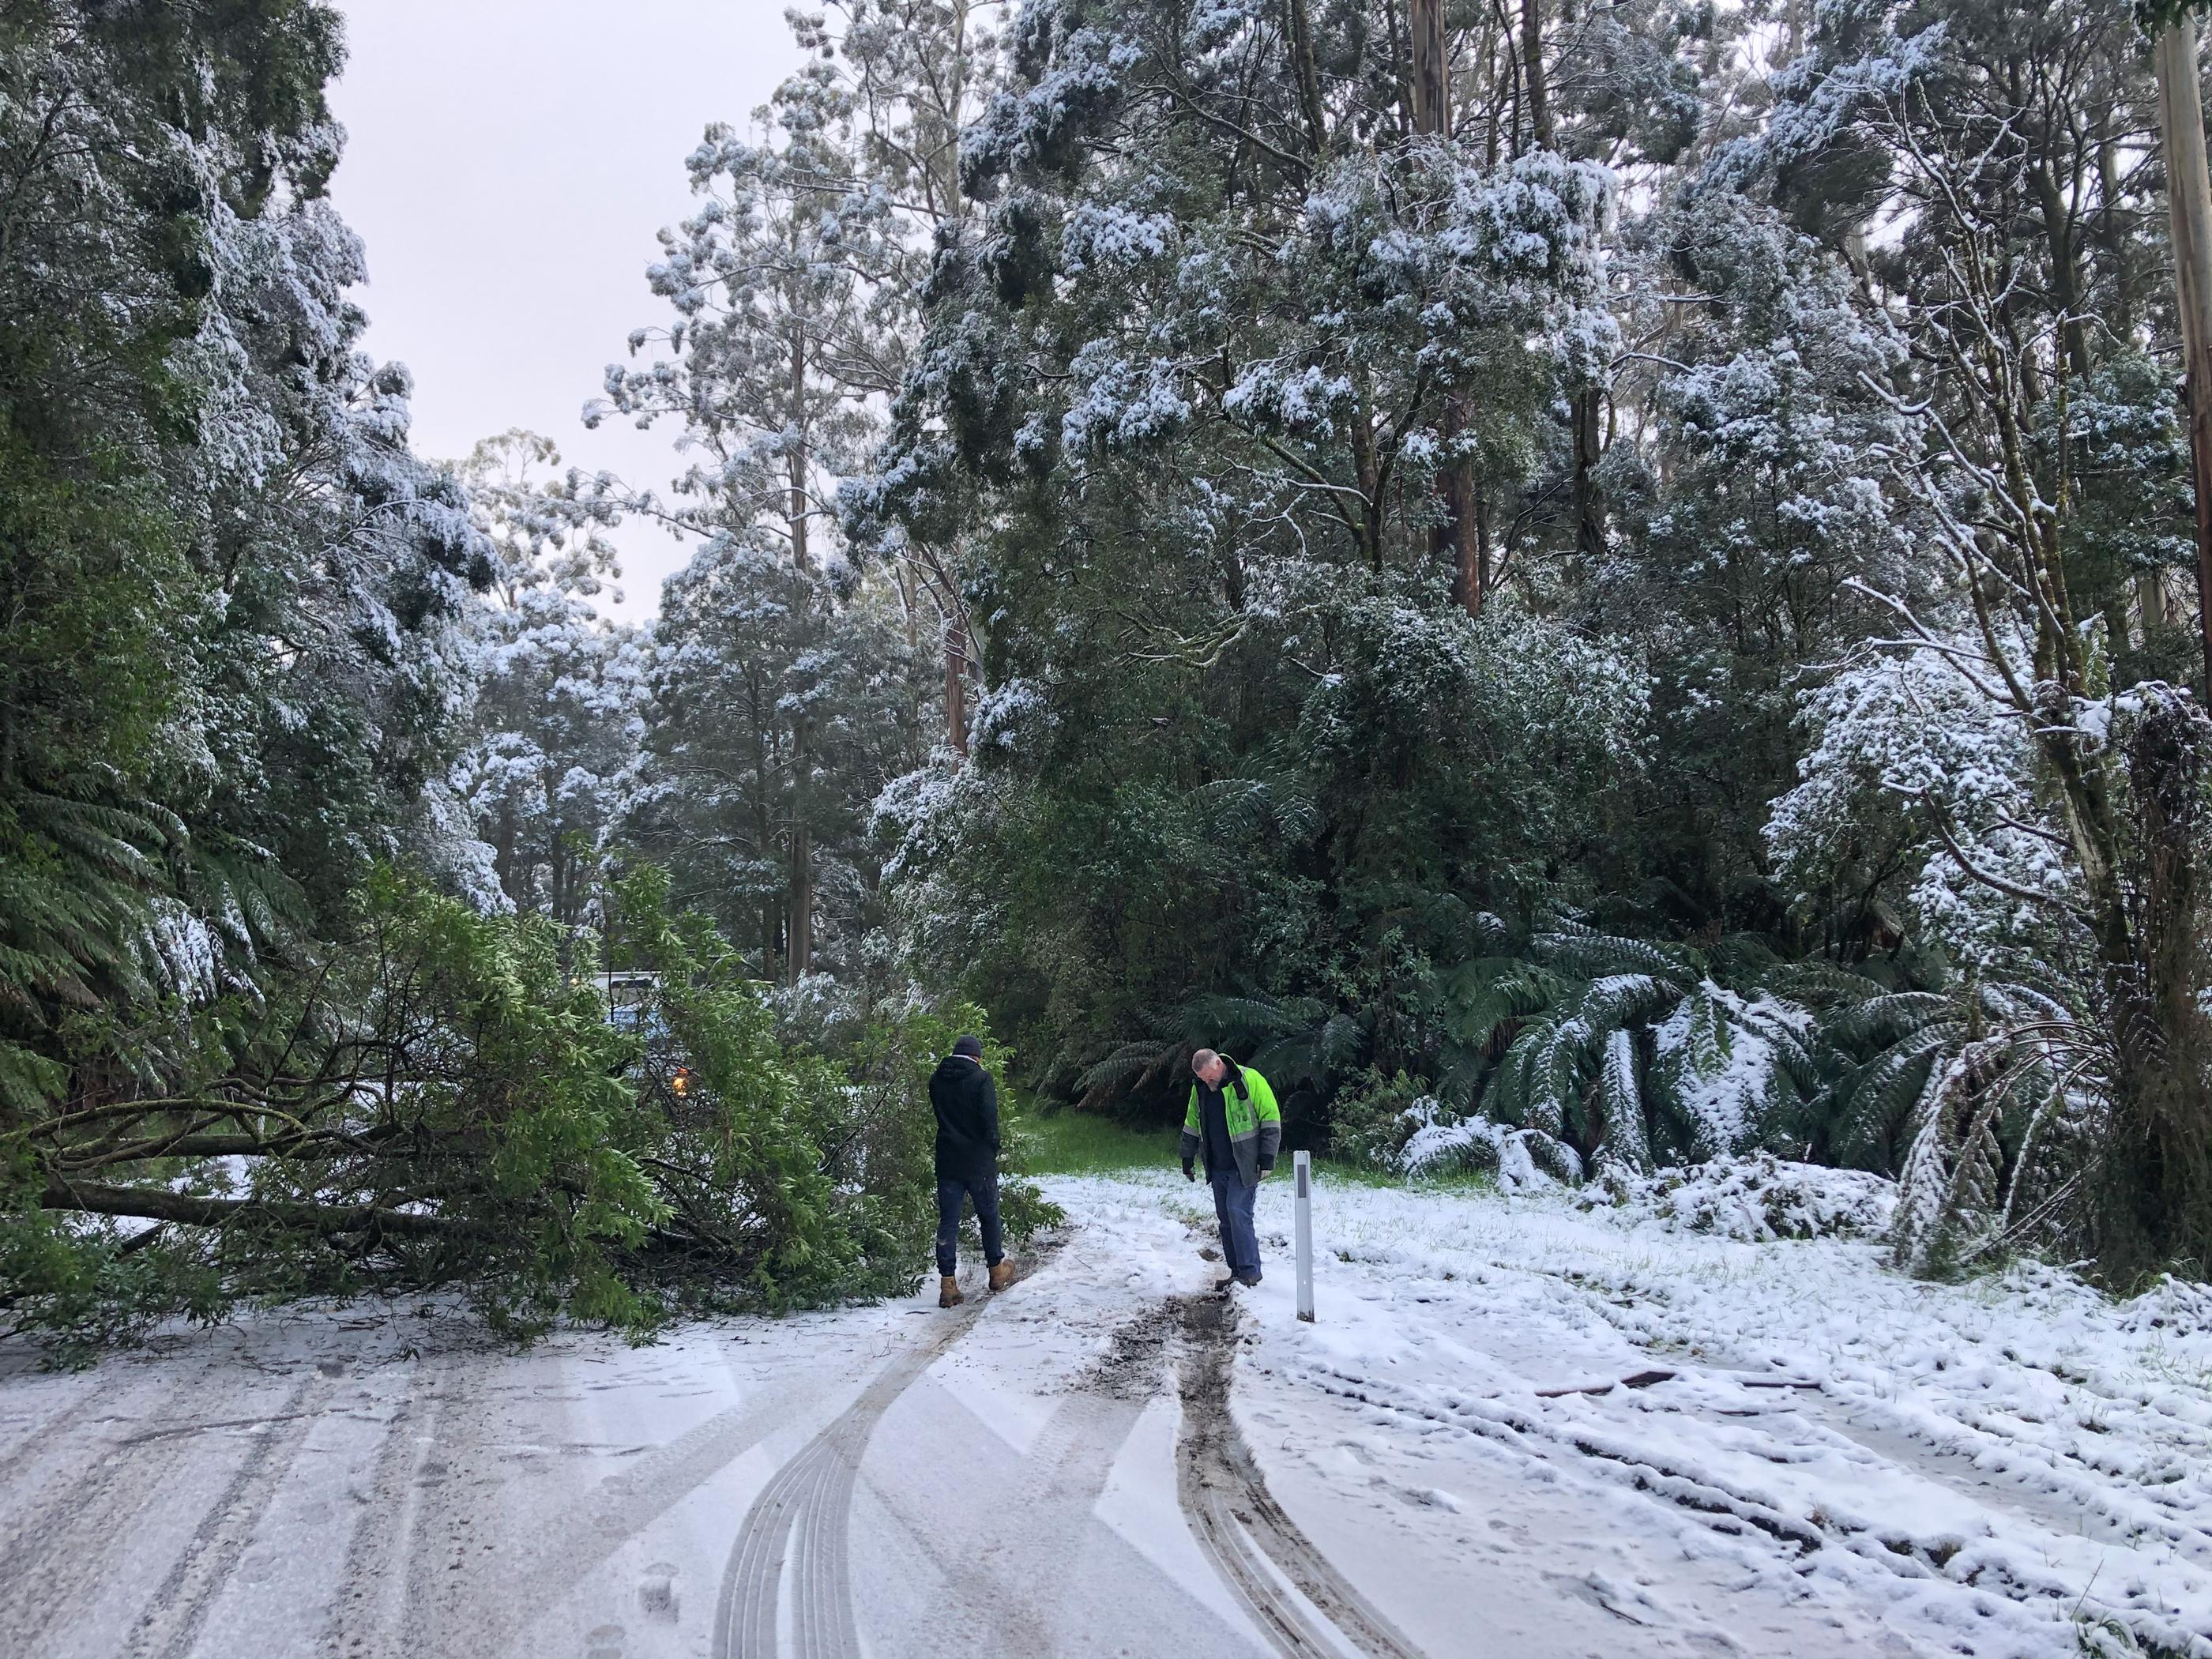 Snow in the Otway Ranges, the Otways